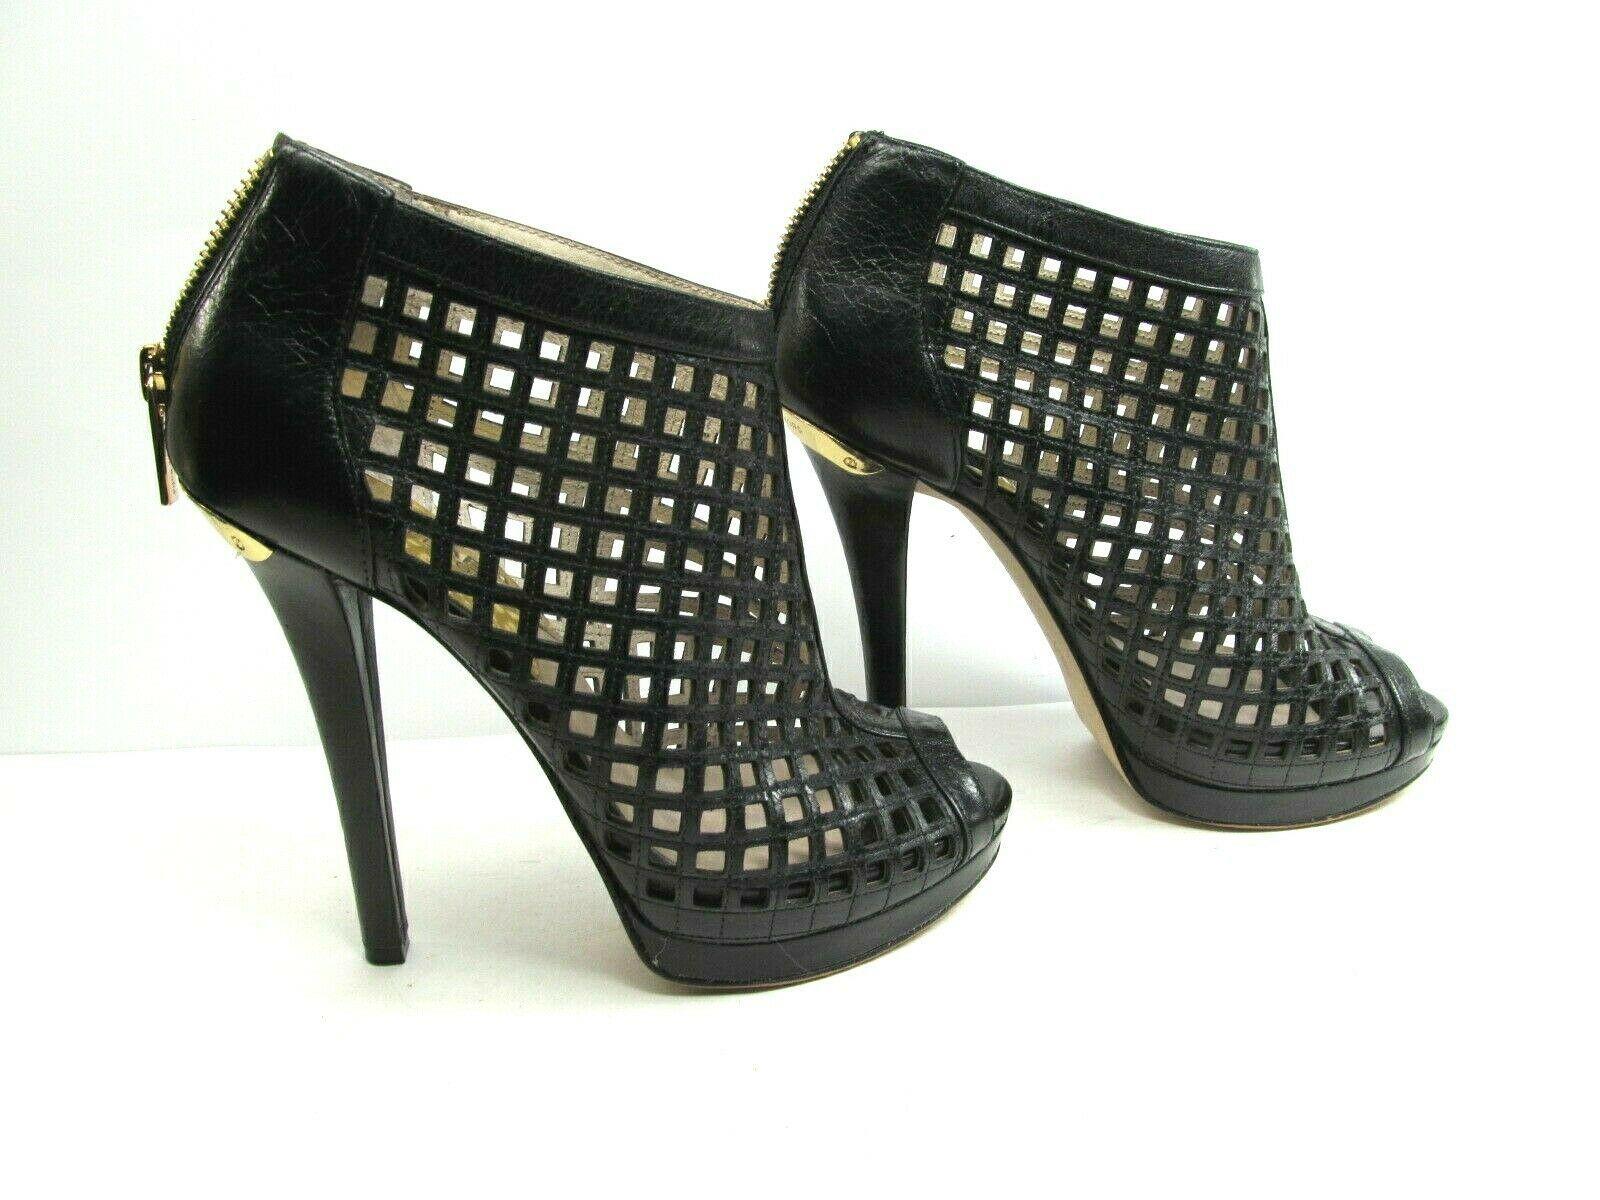 Michael Kors Womens Peep Toe Stilettos Platforms With Cutouts Size US 6 M